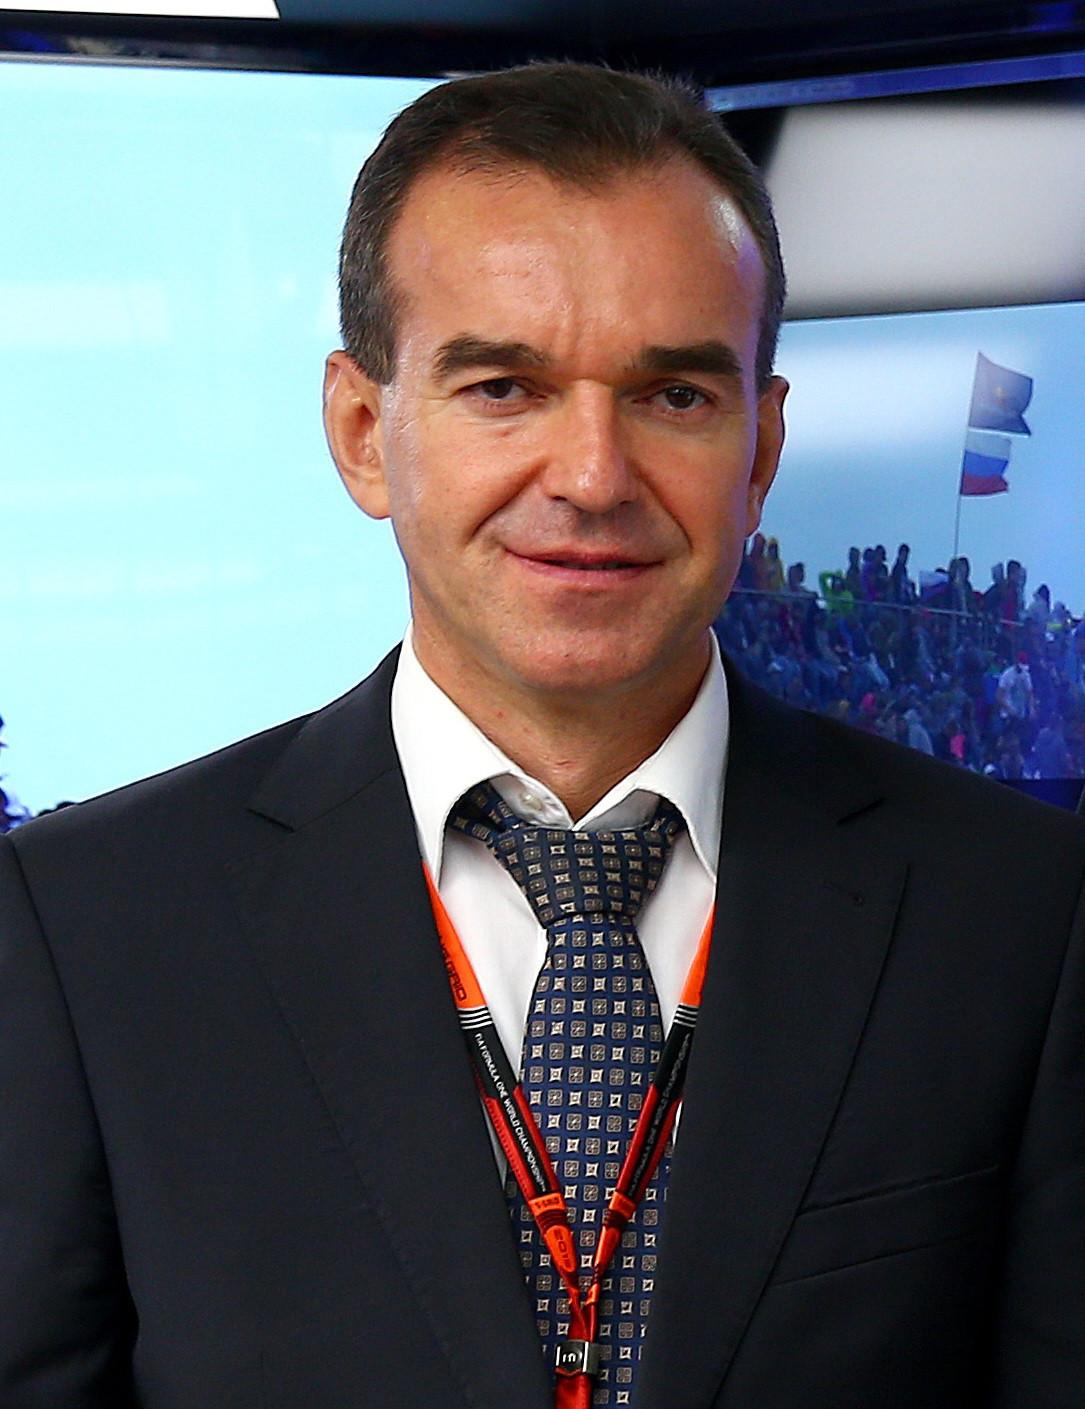 Veniamin Kondratyev, the governor of Krasnodar Krai, has spoken of the region's intention to bid for the European Sambo Championships in 2024 ©Getty Images